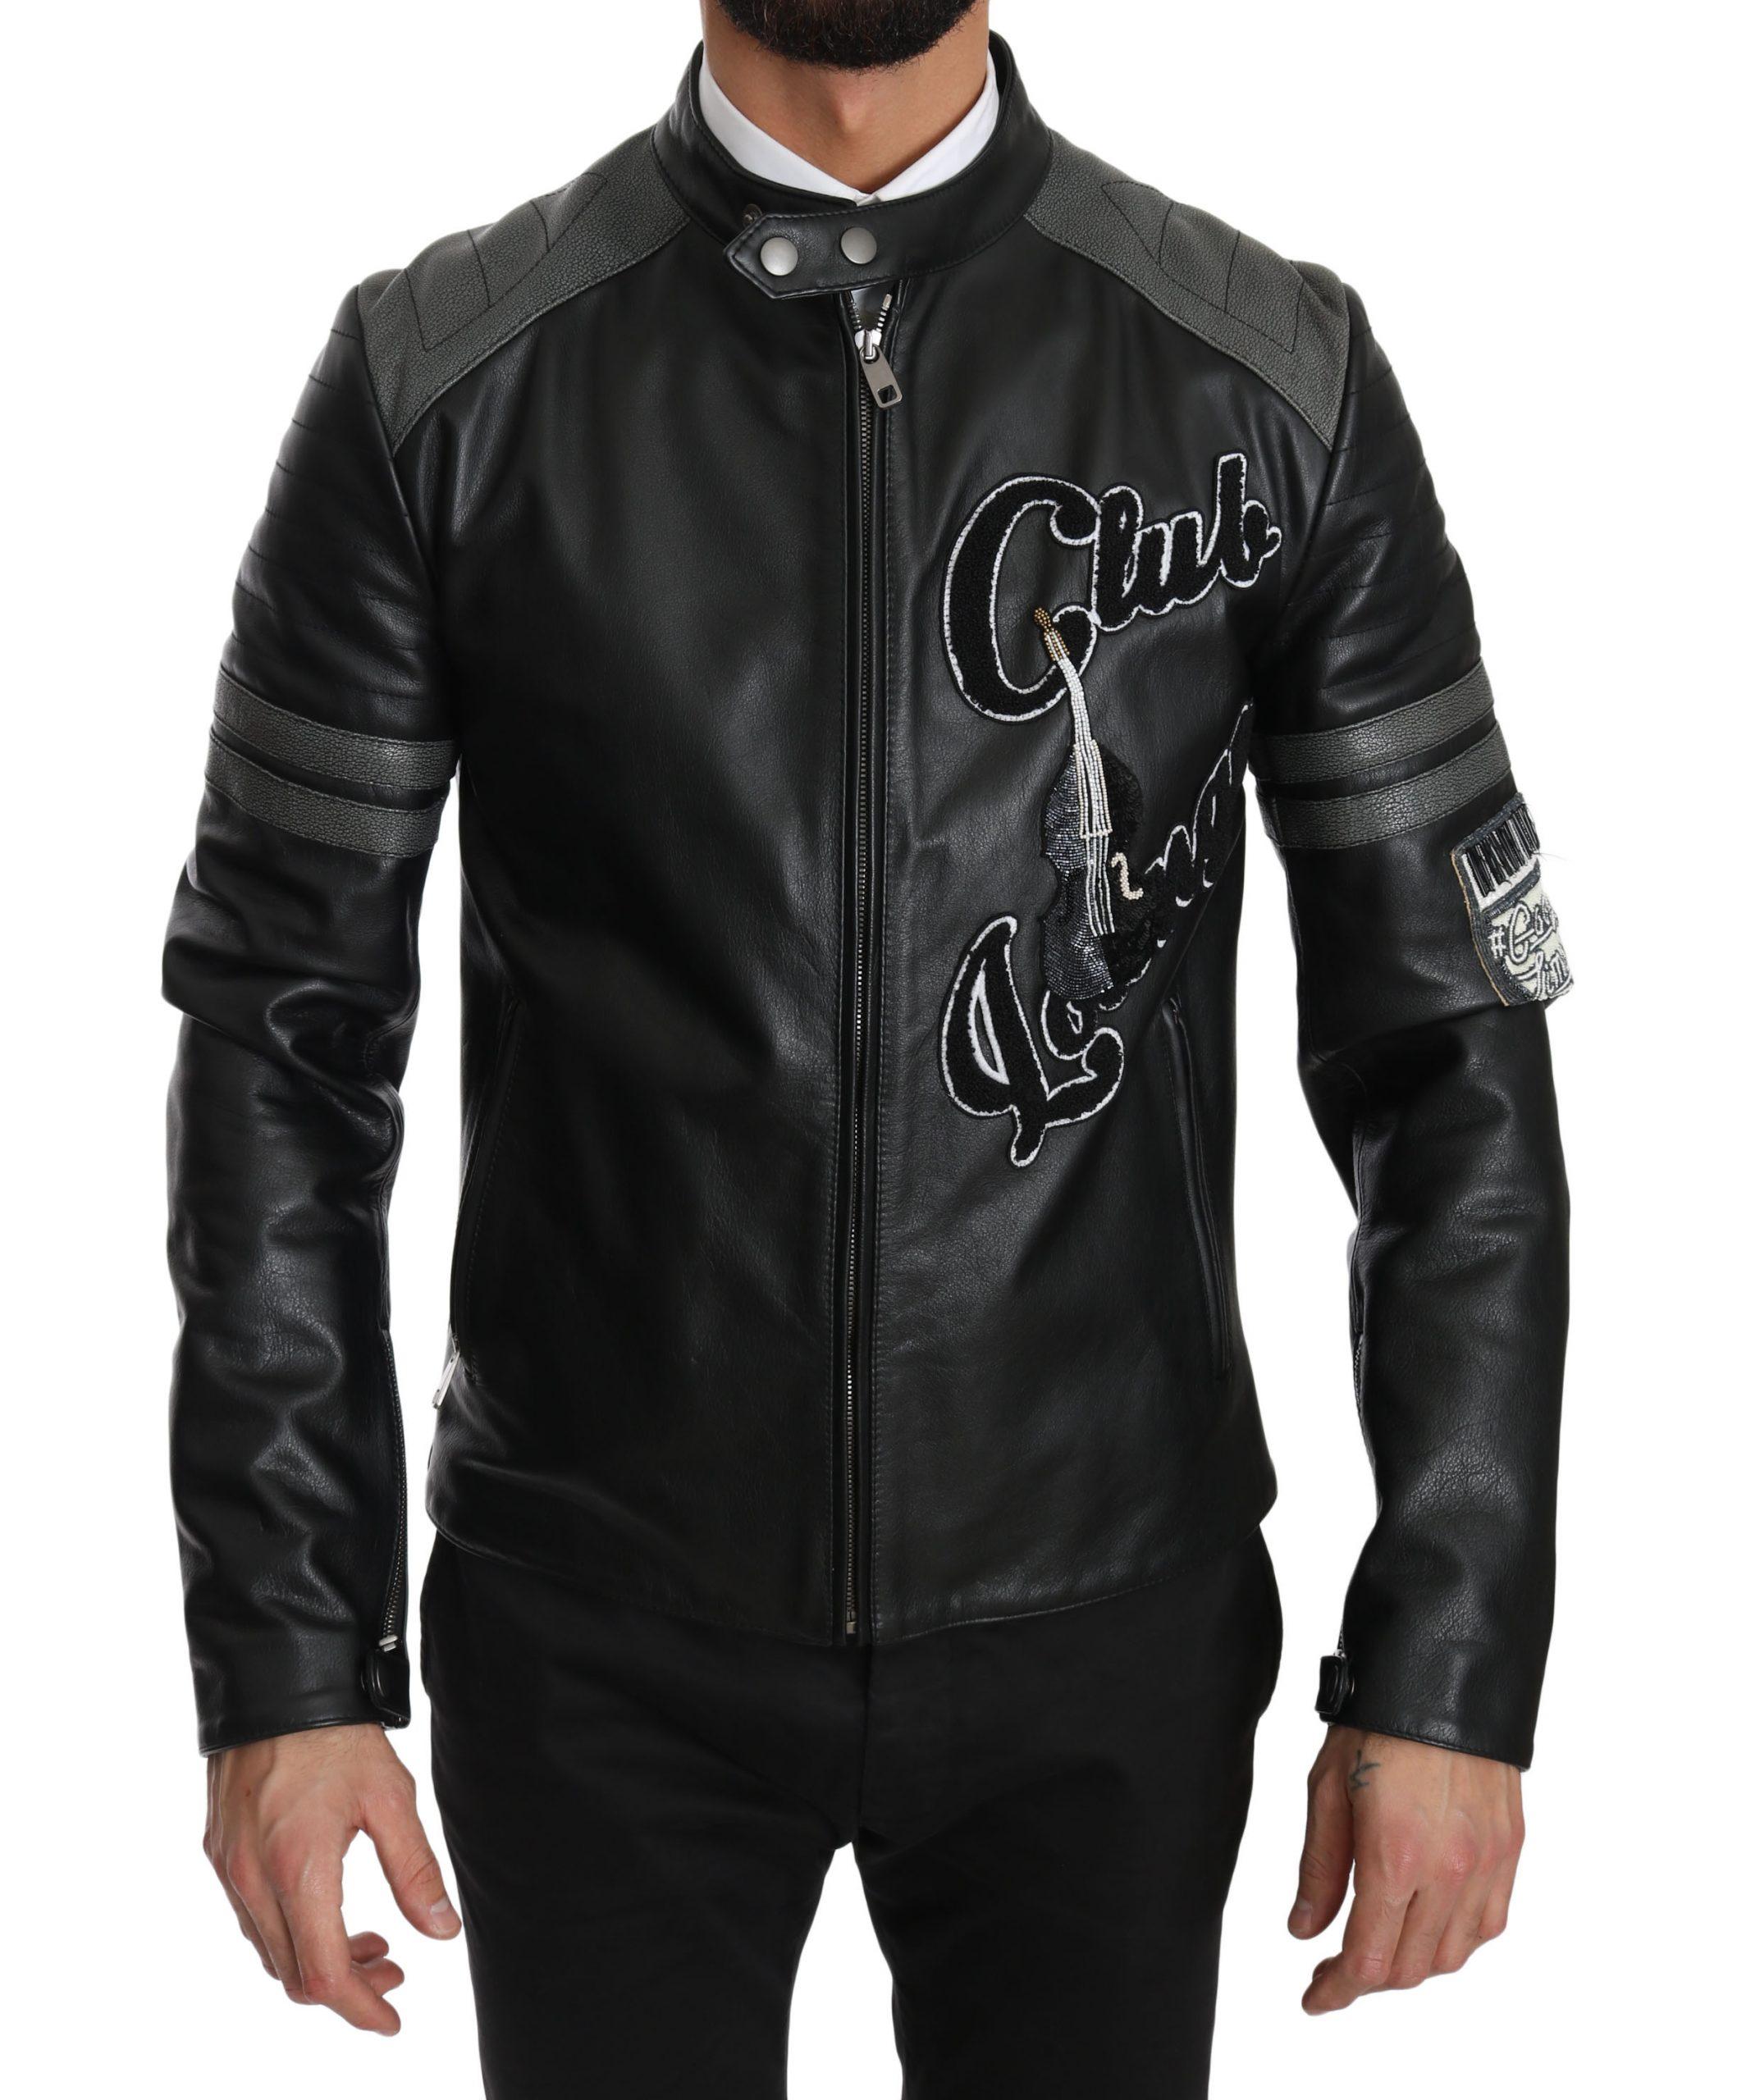 Dolce & Gabbana Black Leather Bullskin Club Bomber Jacket - Size: IT48 | M